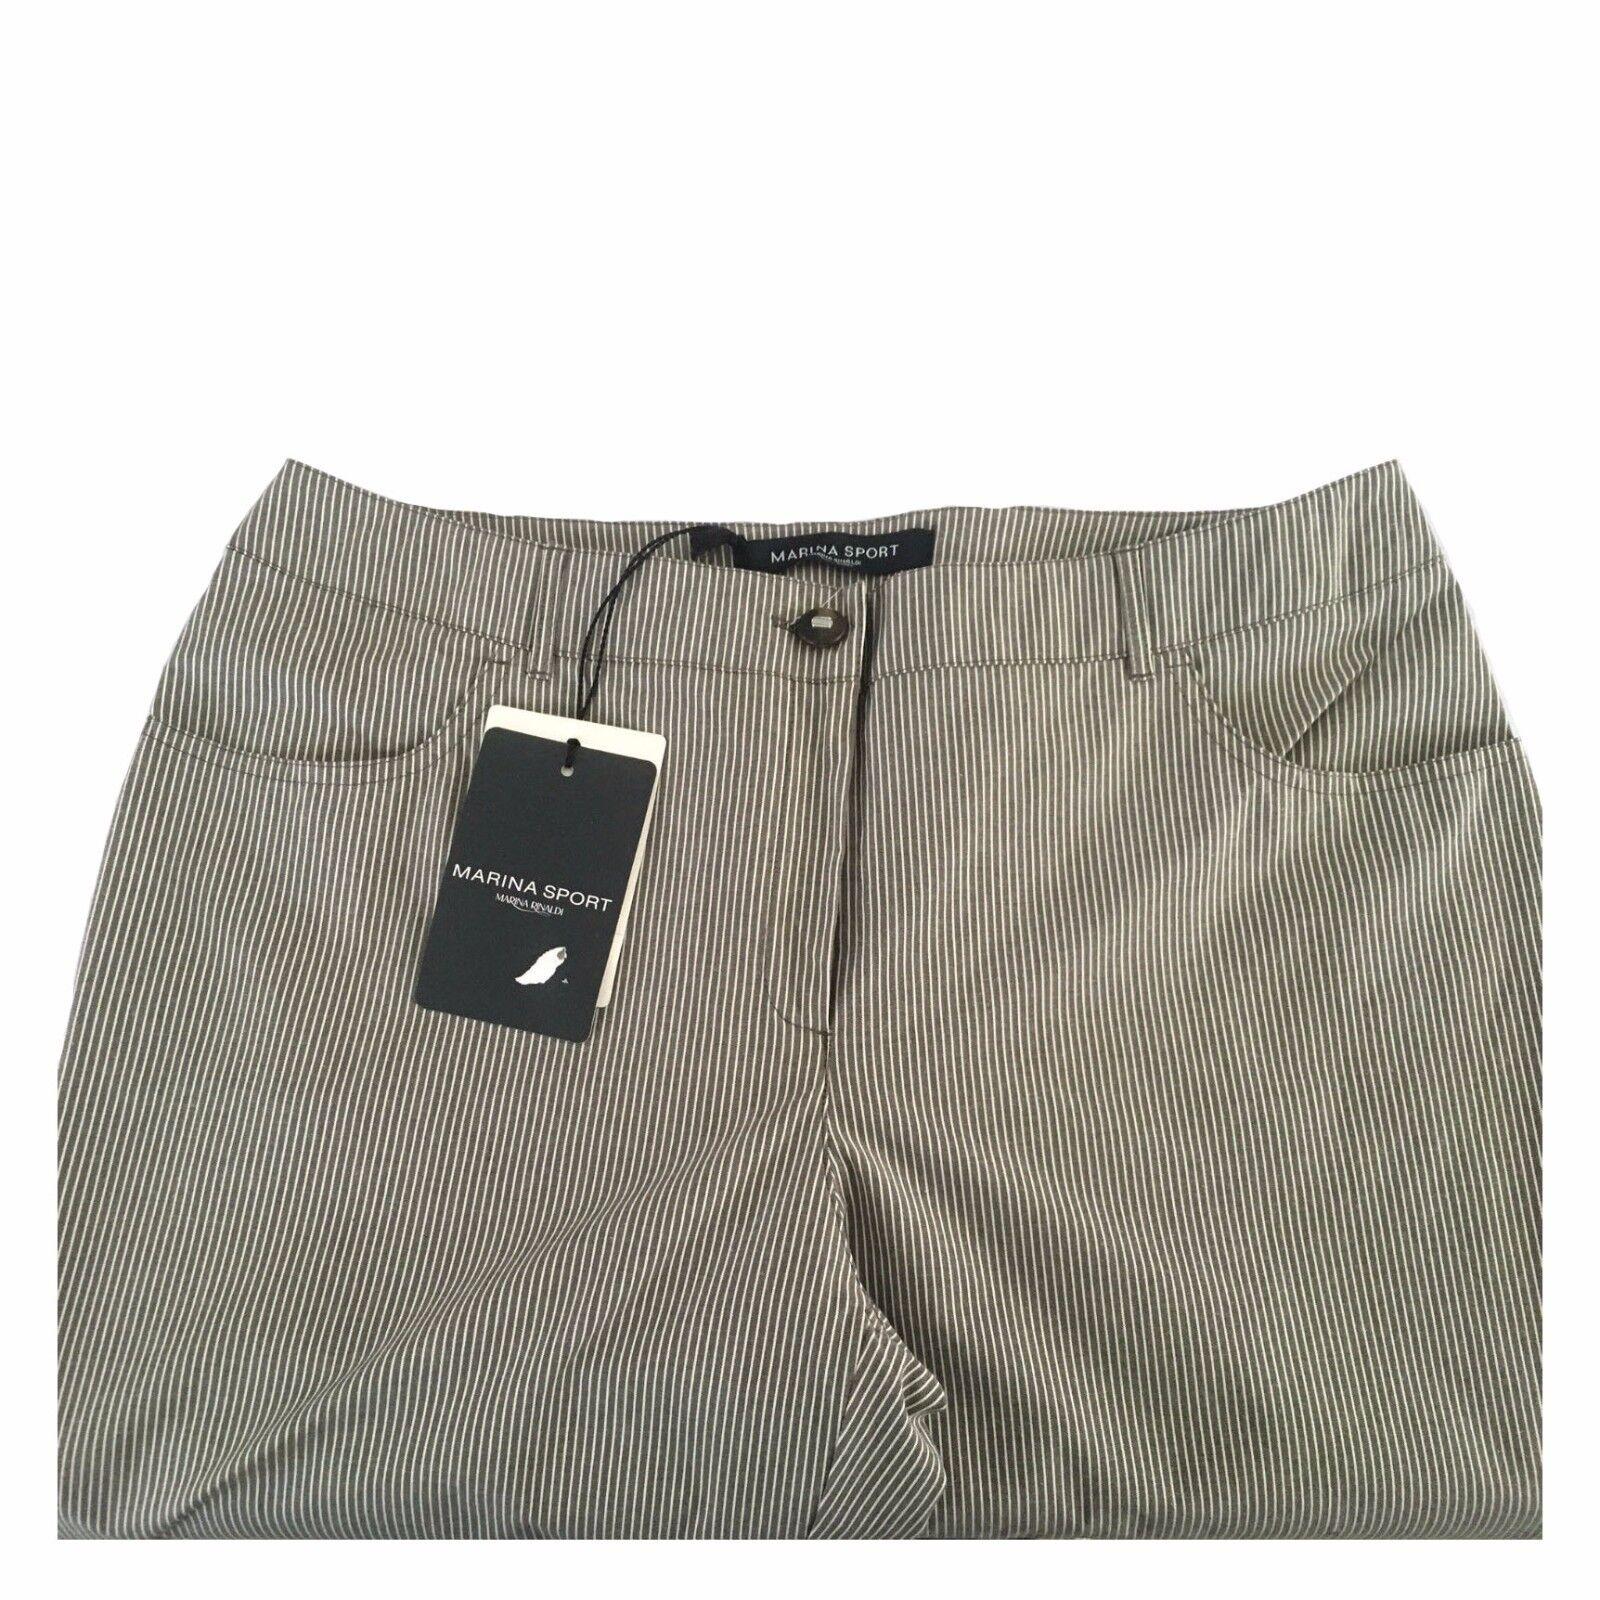 MARINA SPORT by Marina Rinaldi pantalone pantalone pantalone donna righe grigio avorio fondo cm 18 d87f08